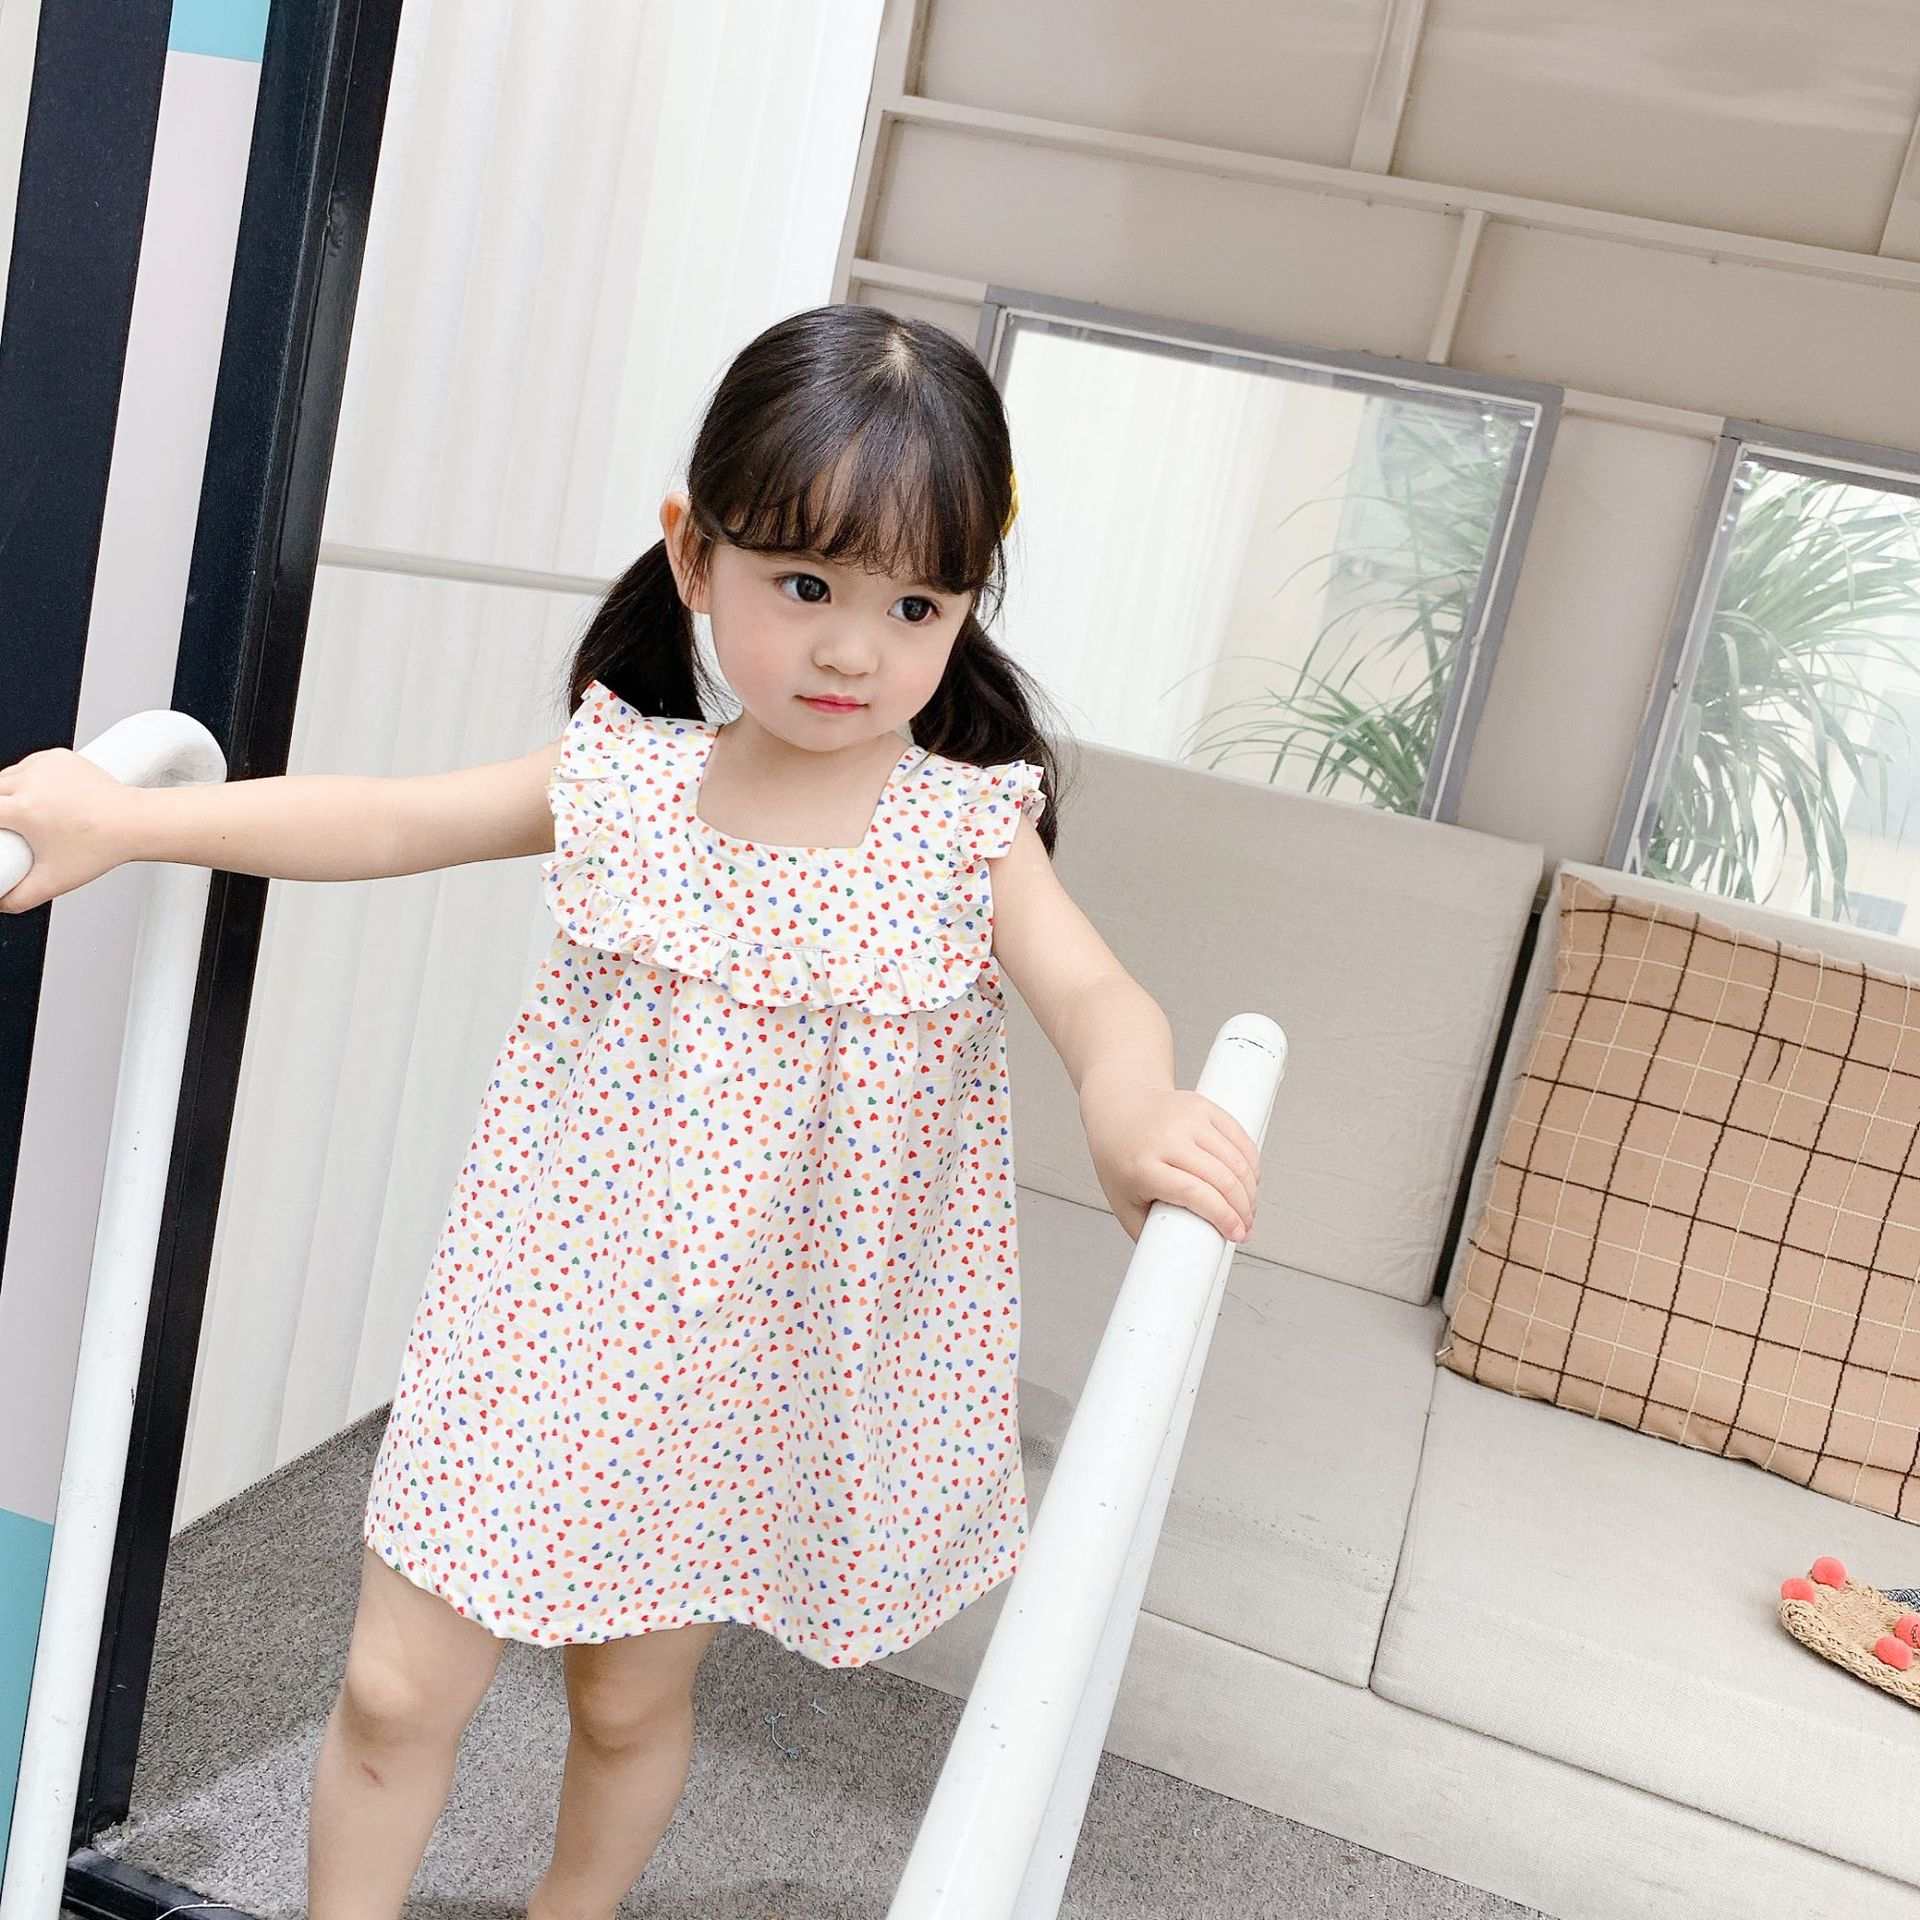 Mihkalev Pretty Baby girls summer dresses 2020 kids clothes girls princess dresses  children beach dress vestido menina|Dresses| - AliExpress